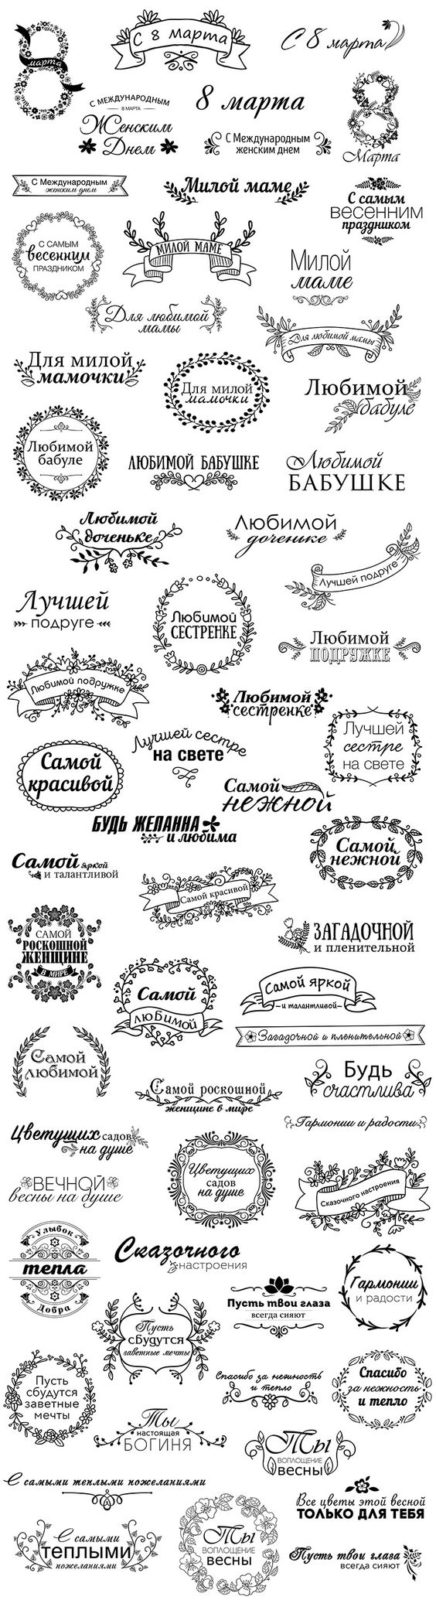 Шаблоны надписи для скрапбукинга